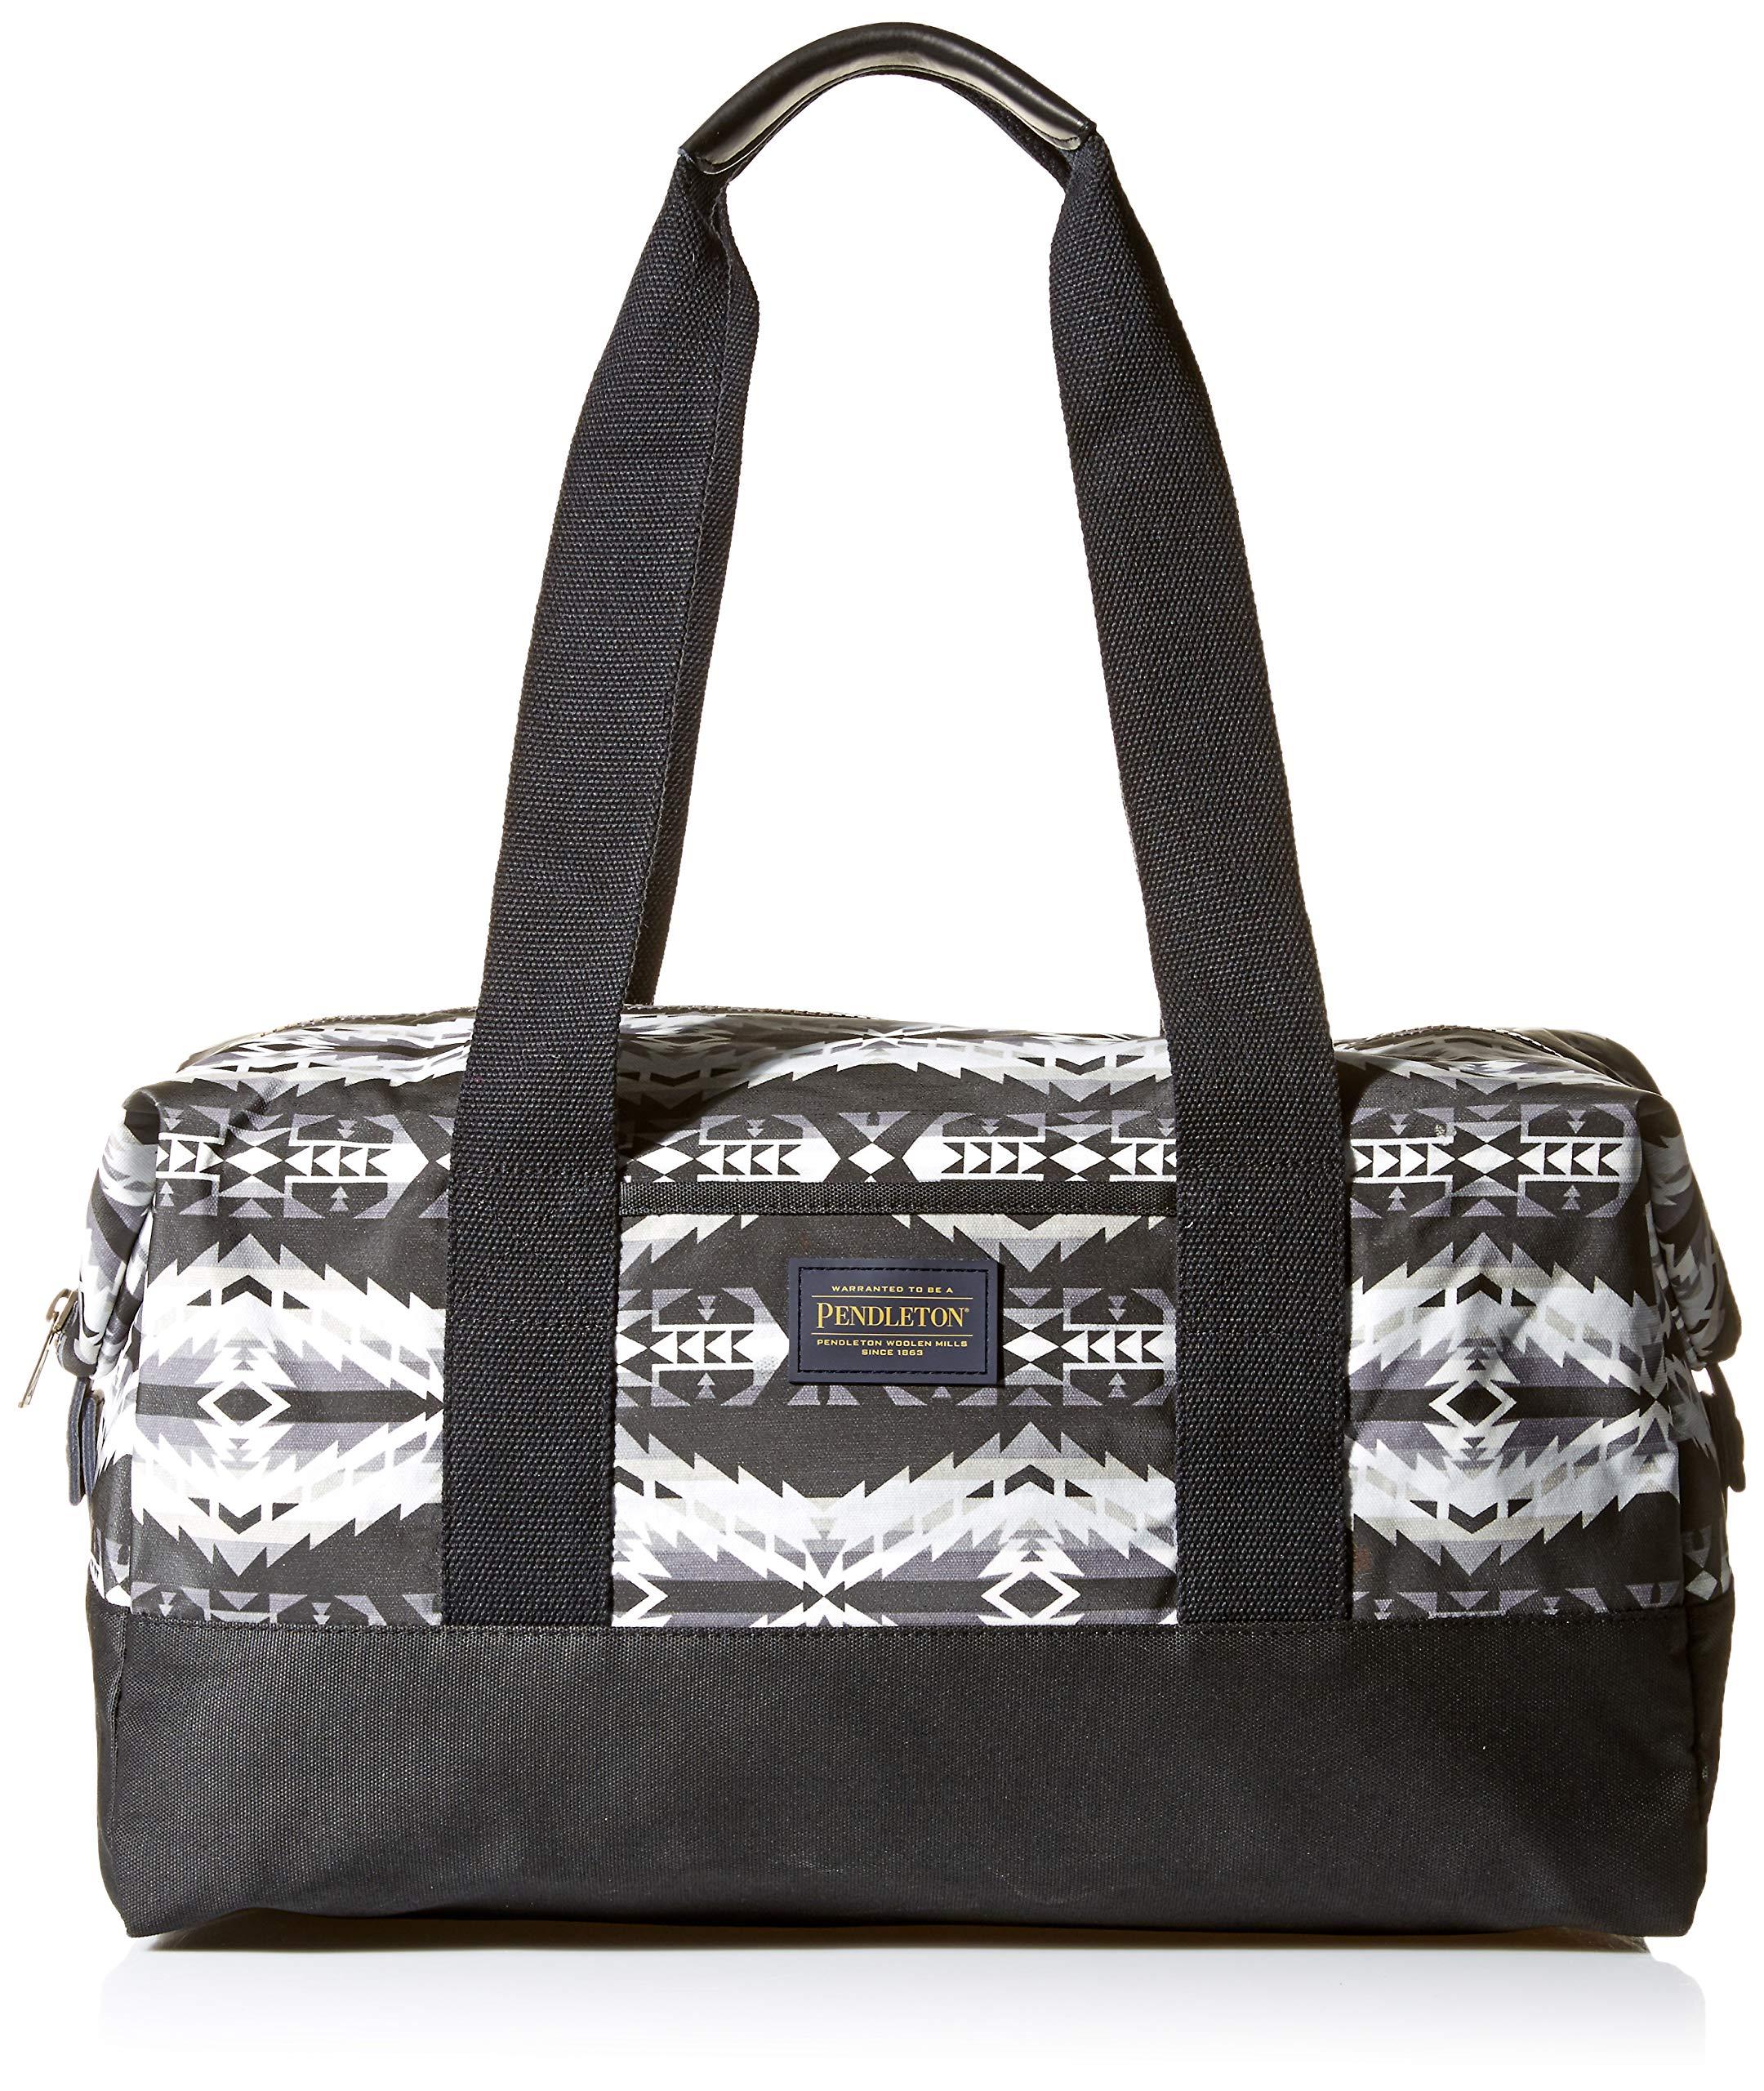 Pendleton Men's Canopy Canvas Weekender Duffel Bag, Hawkeye-54475, One Size